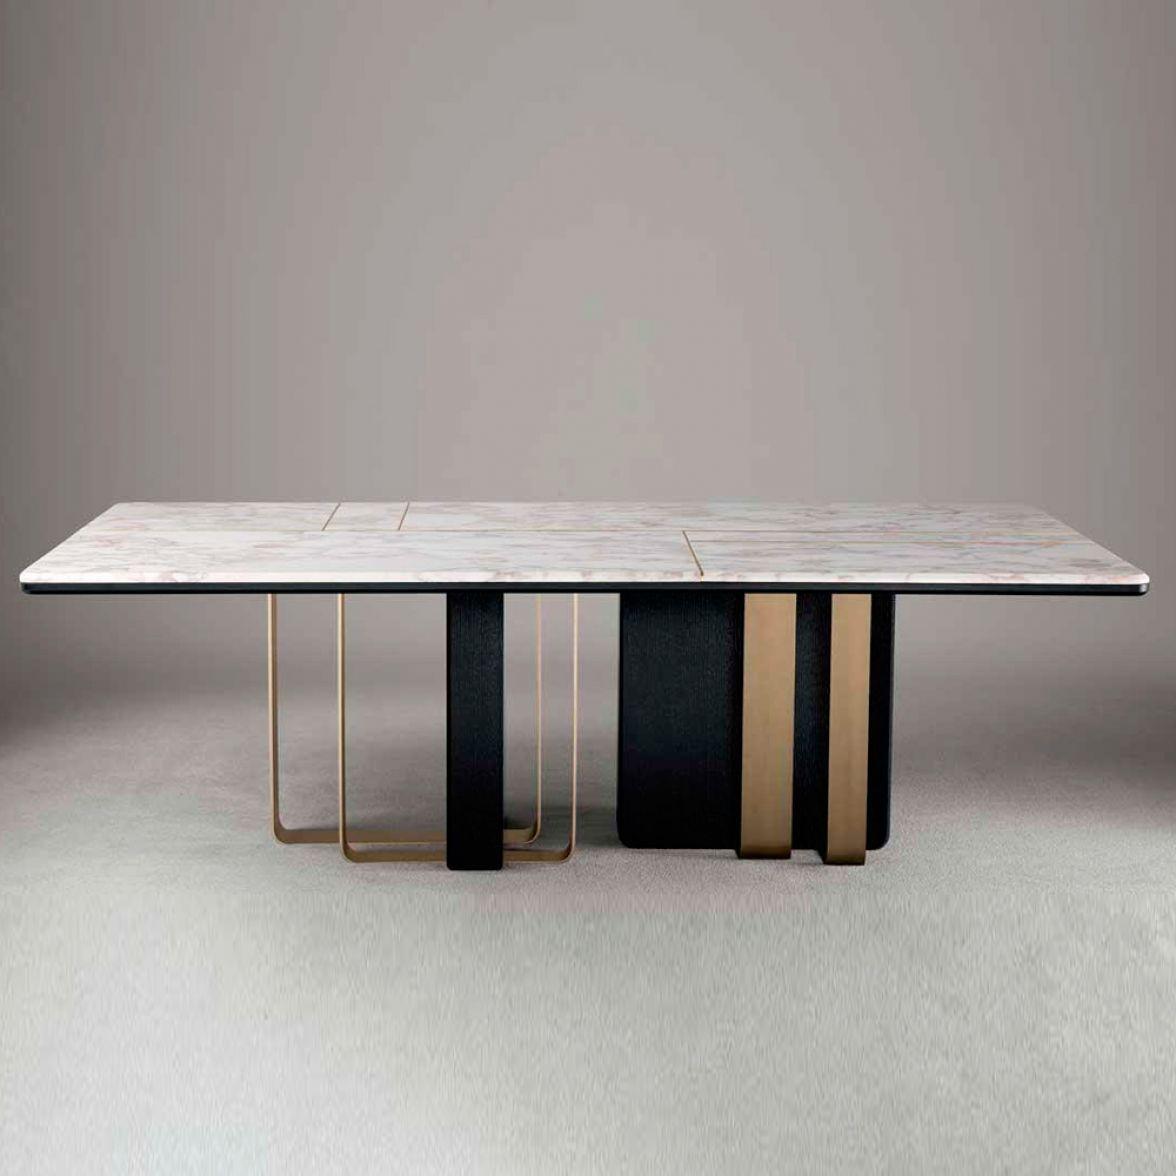 Saint dining table